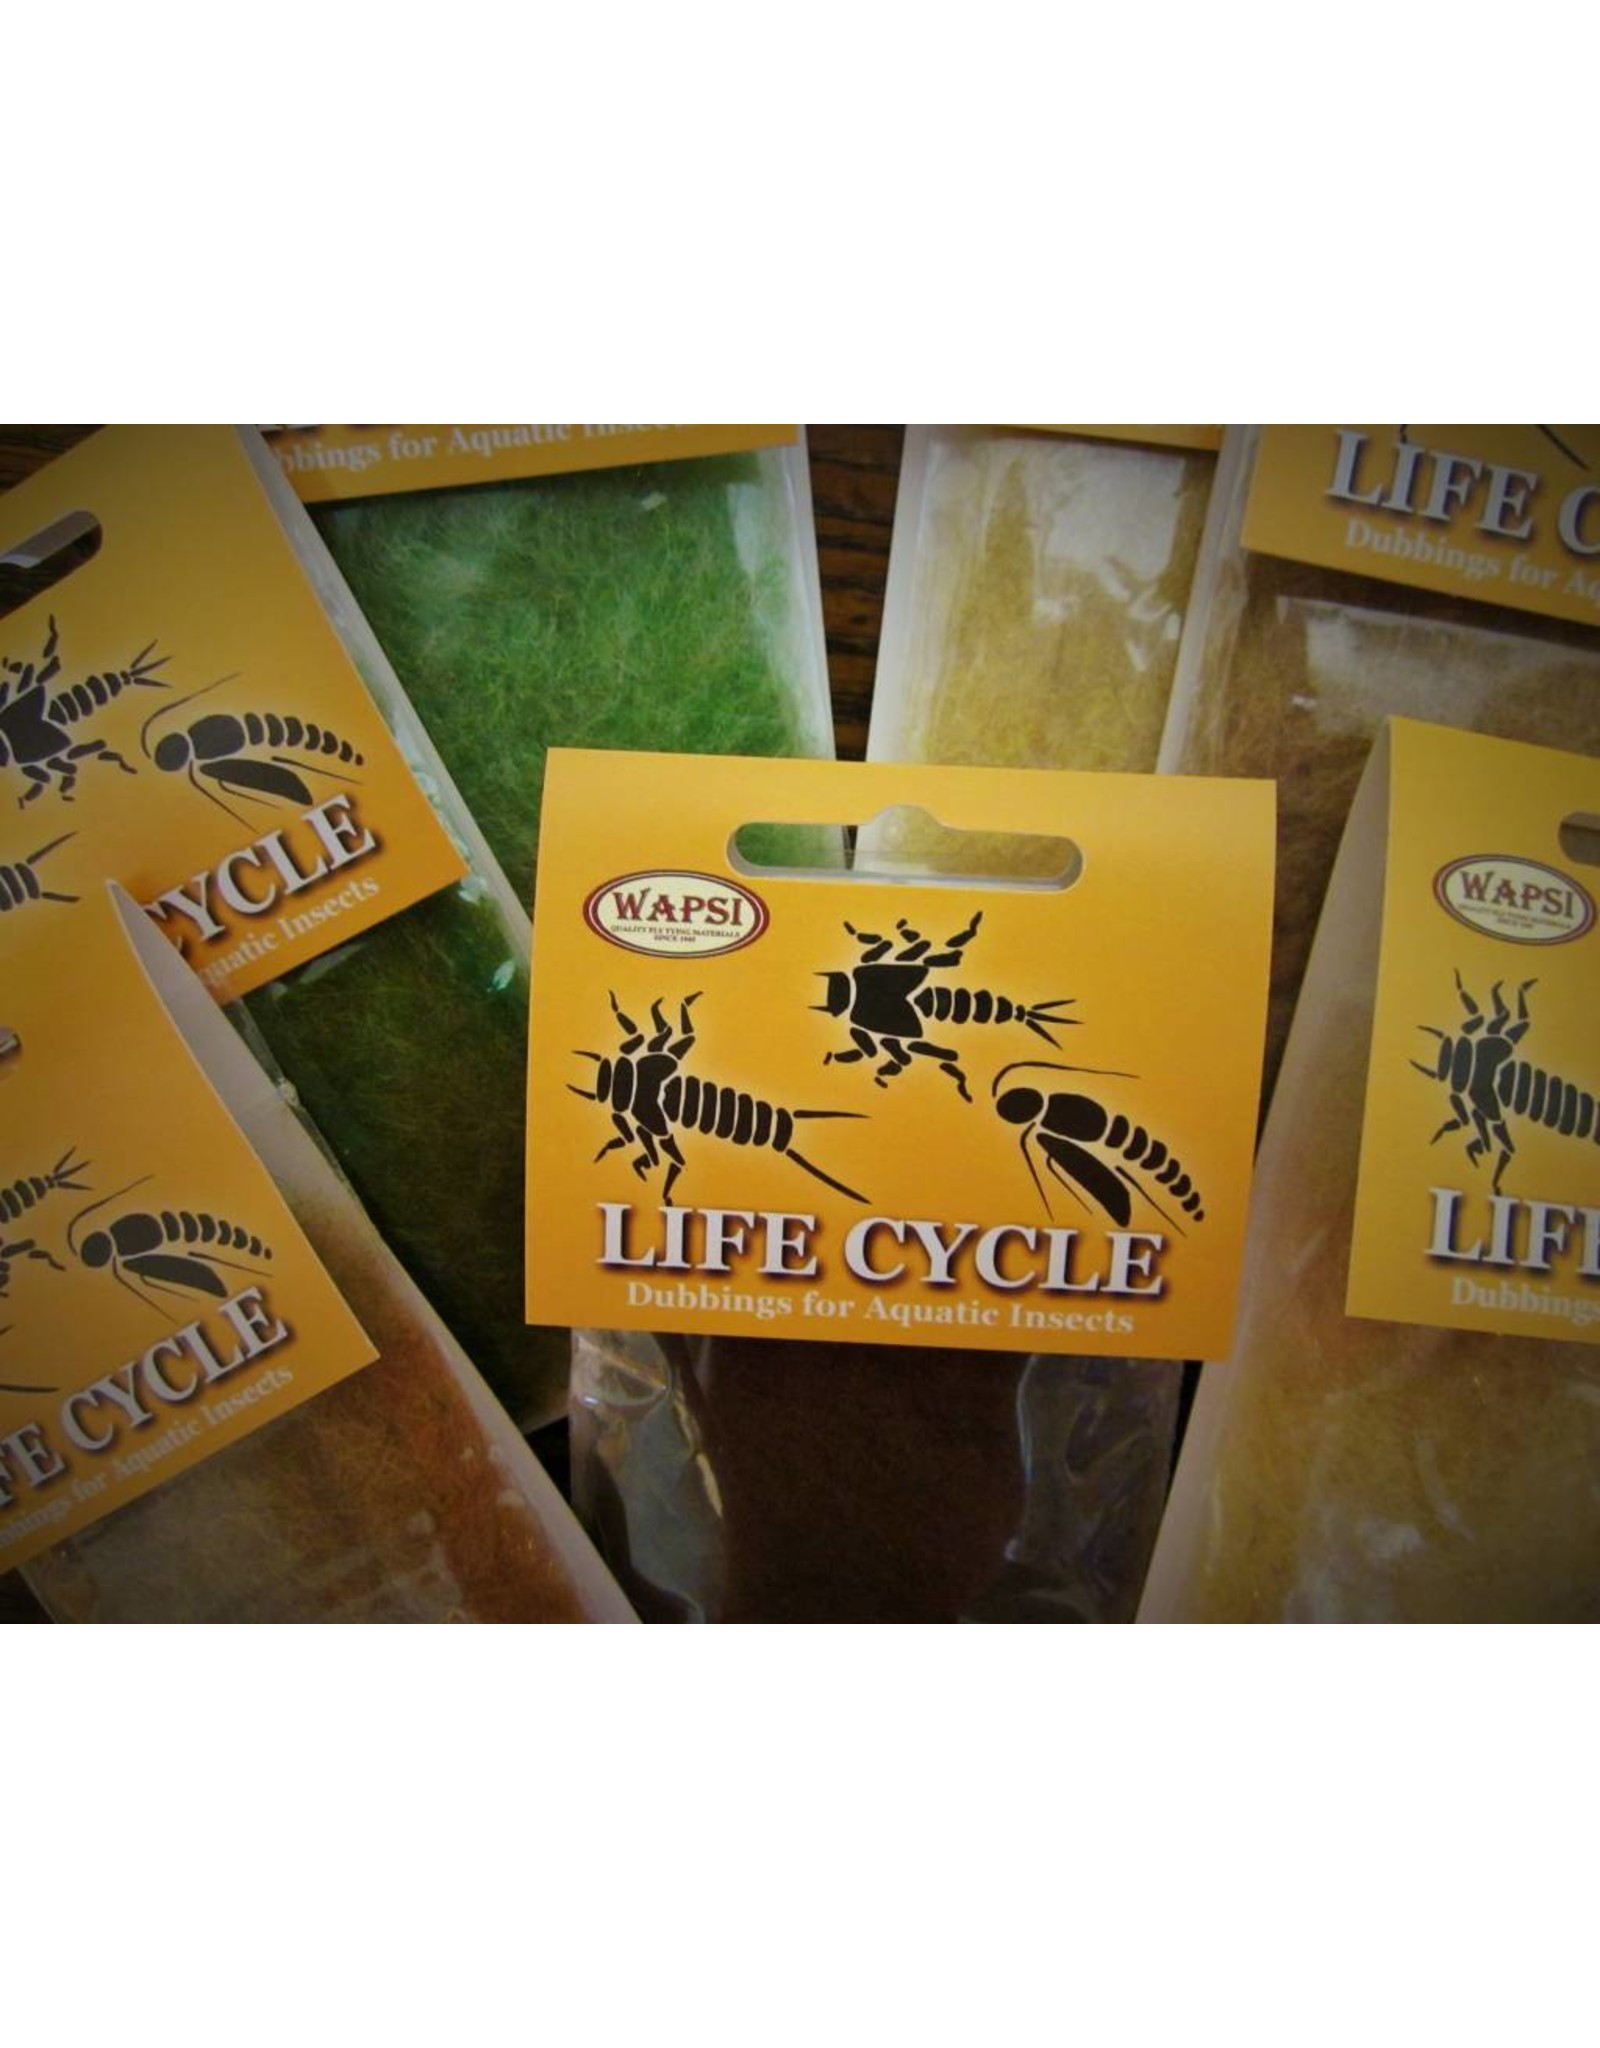 Life Cycle Dubbing